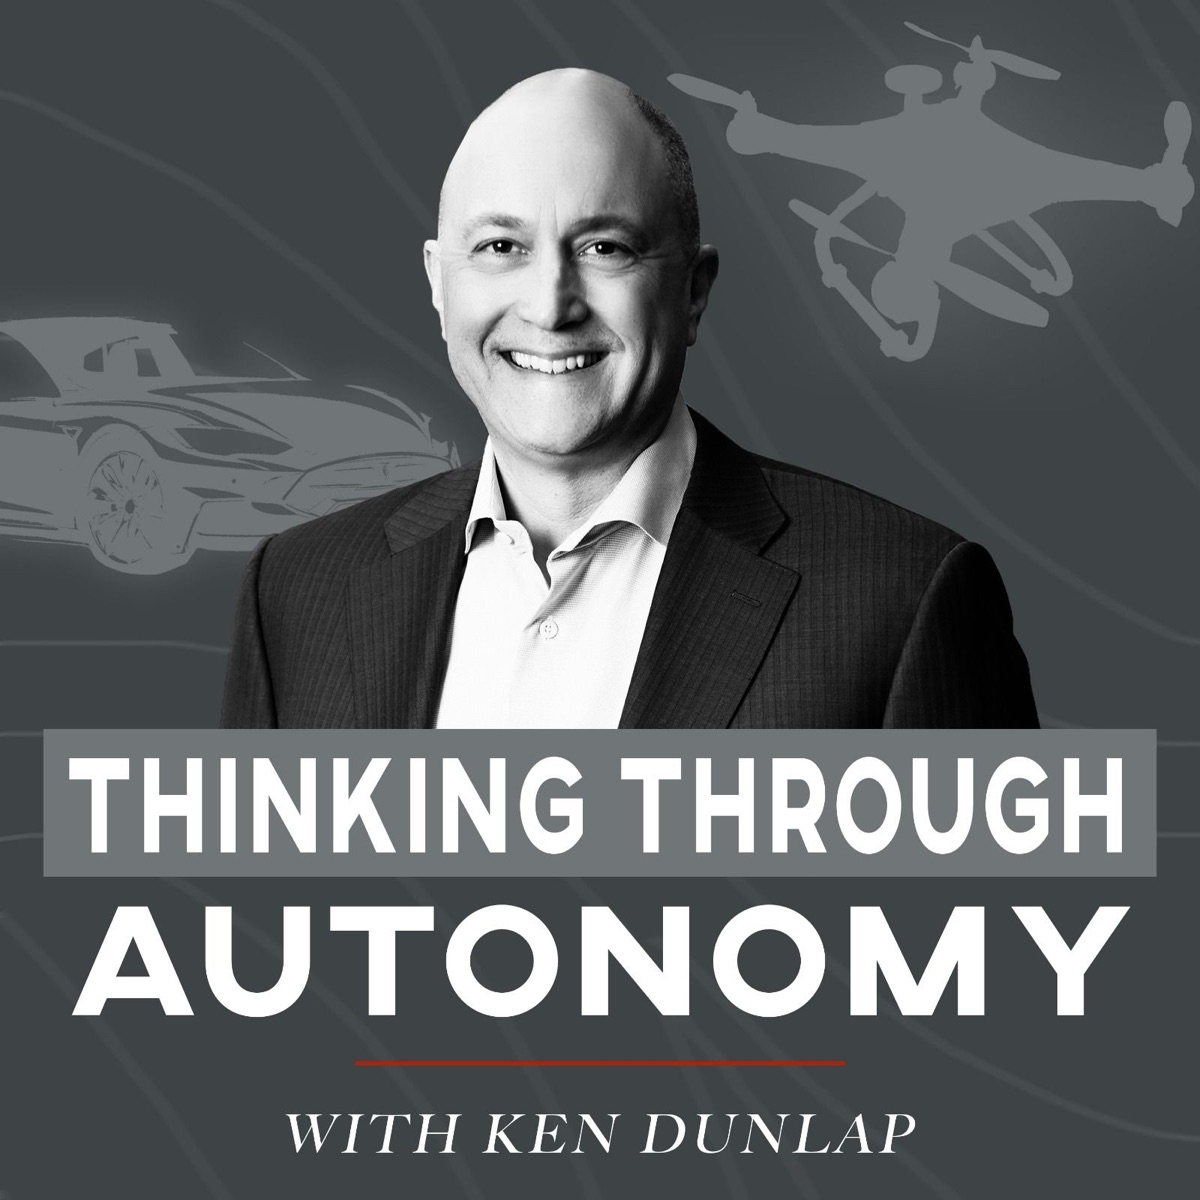 ThinkingThroughAutonomy